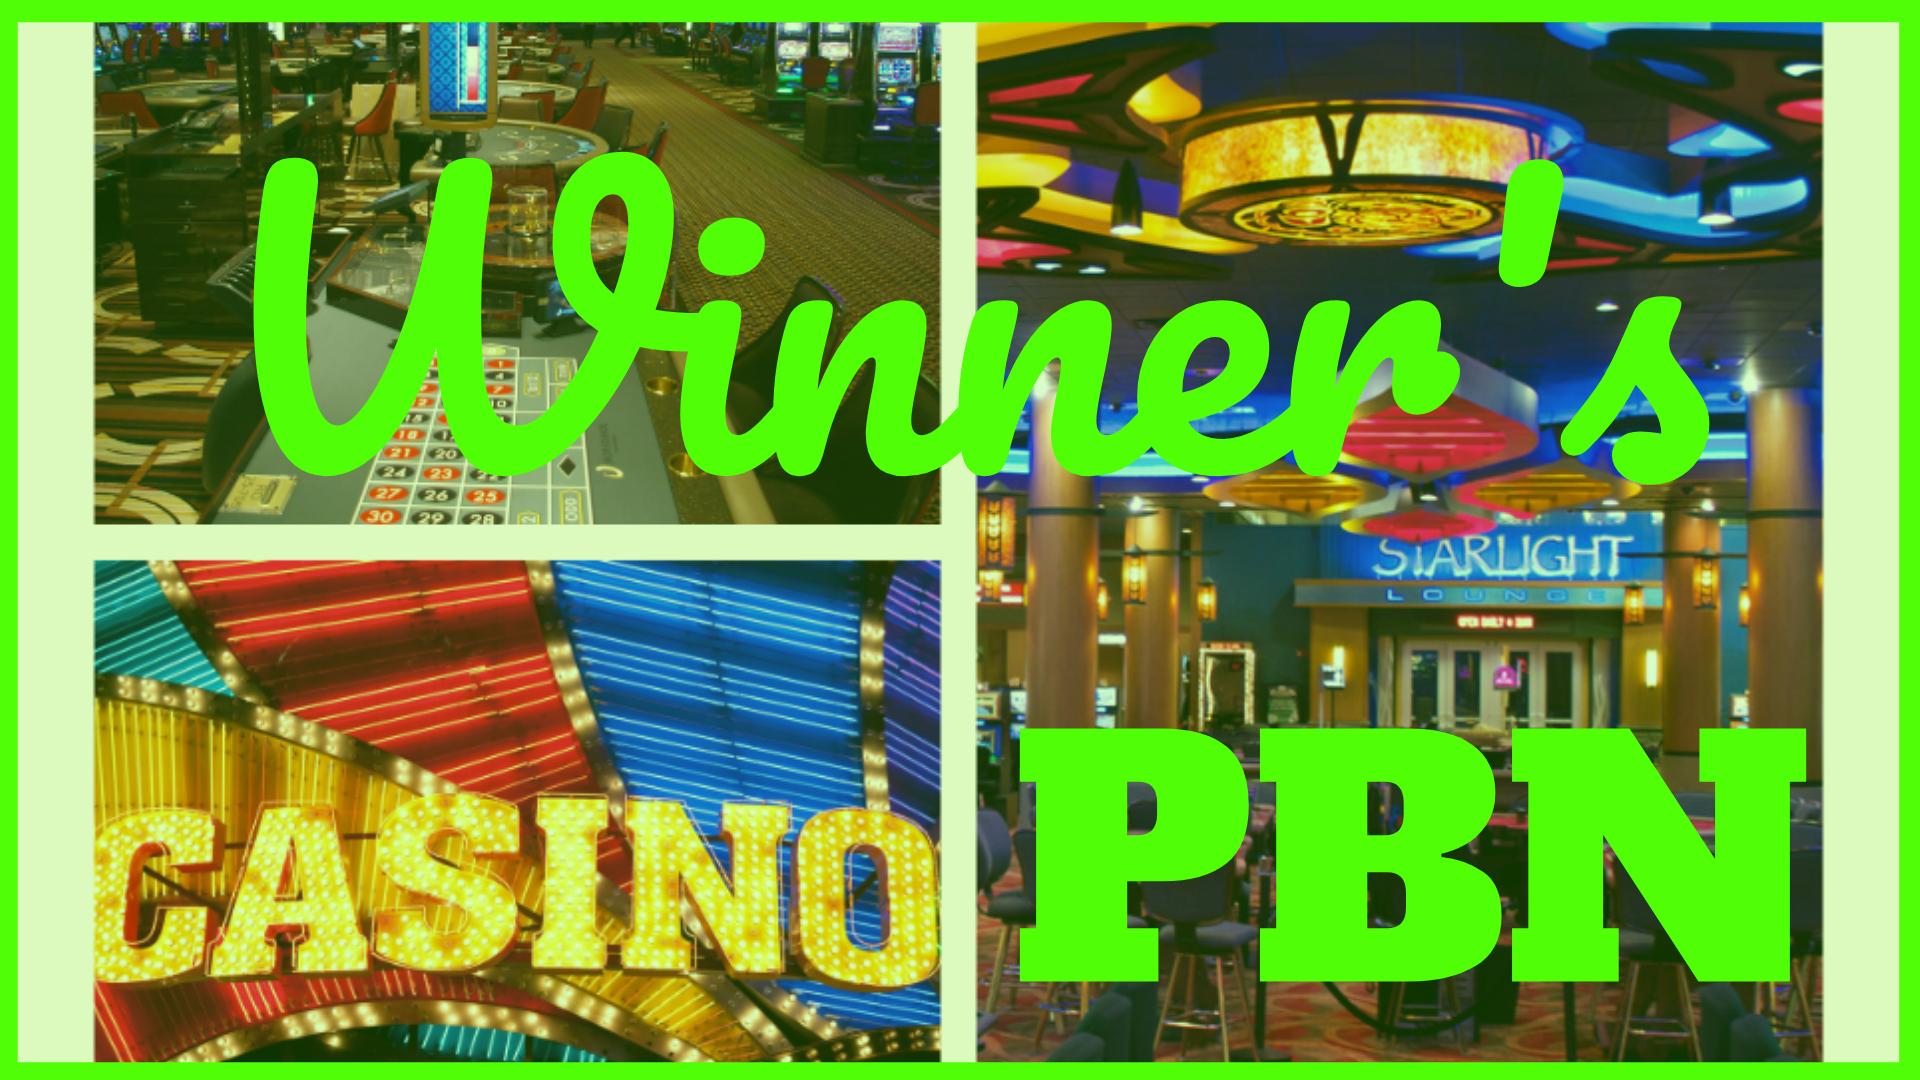 Topmost Casino & Gambling PBN Network - High TF CF DA PA - Handwritten Content by Full-Time Writers